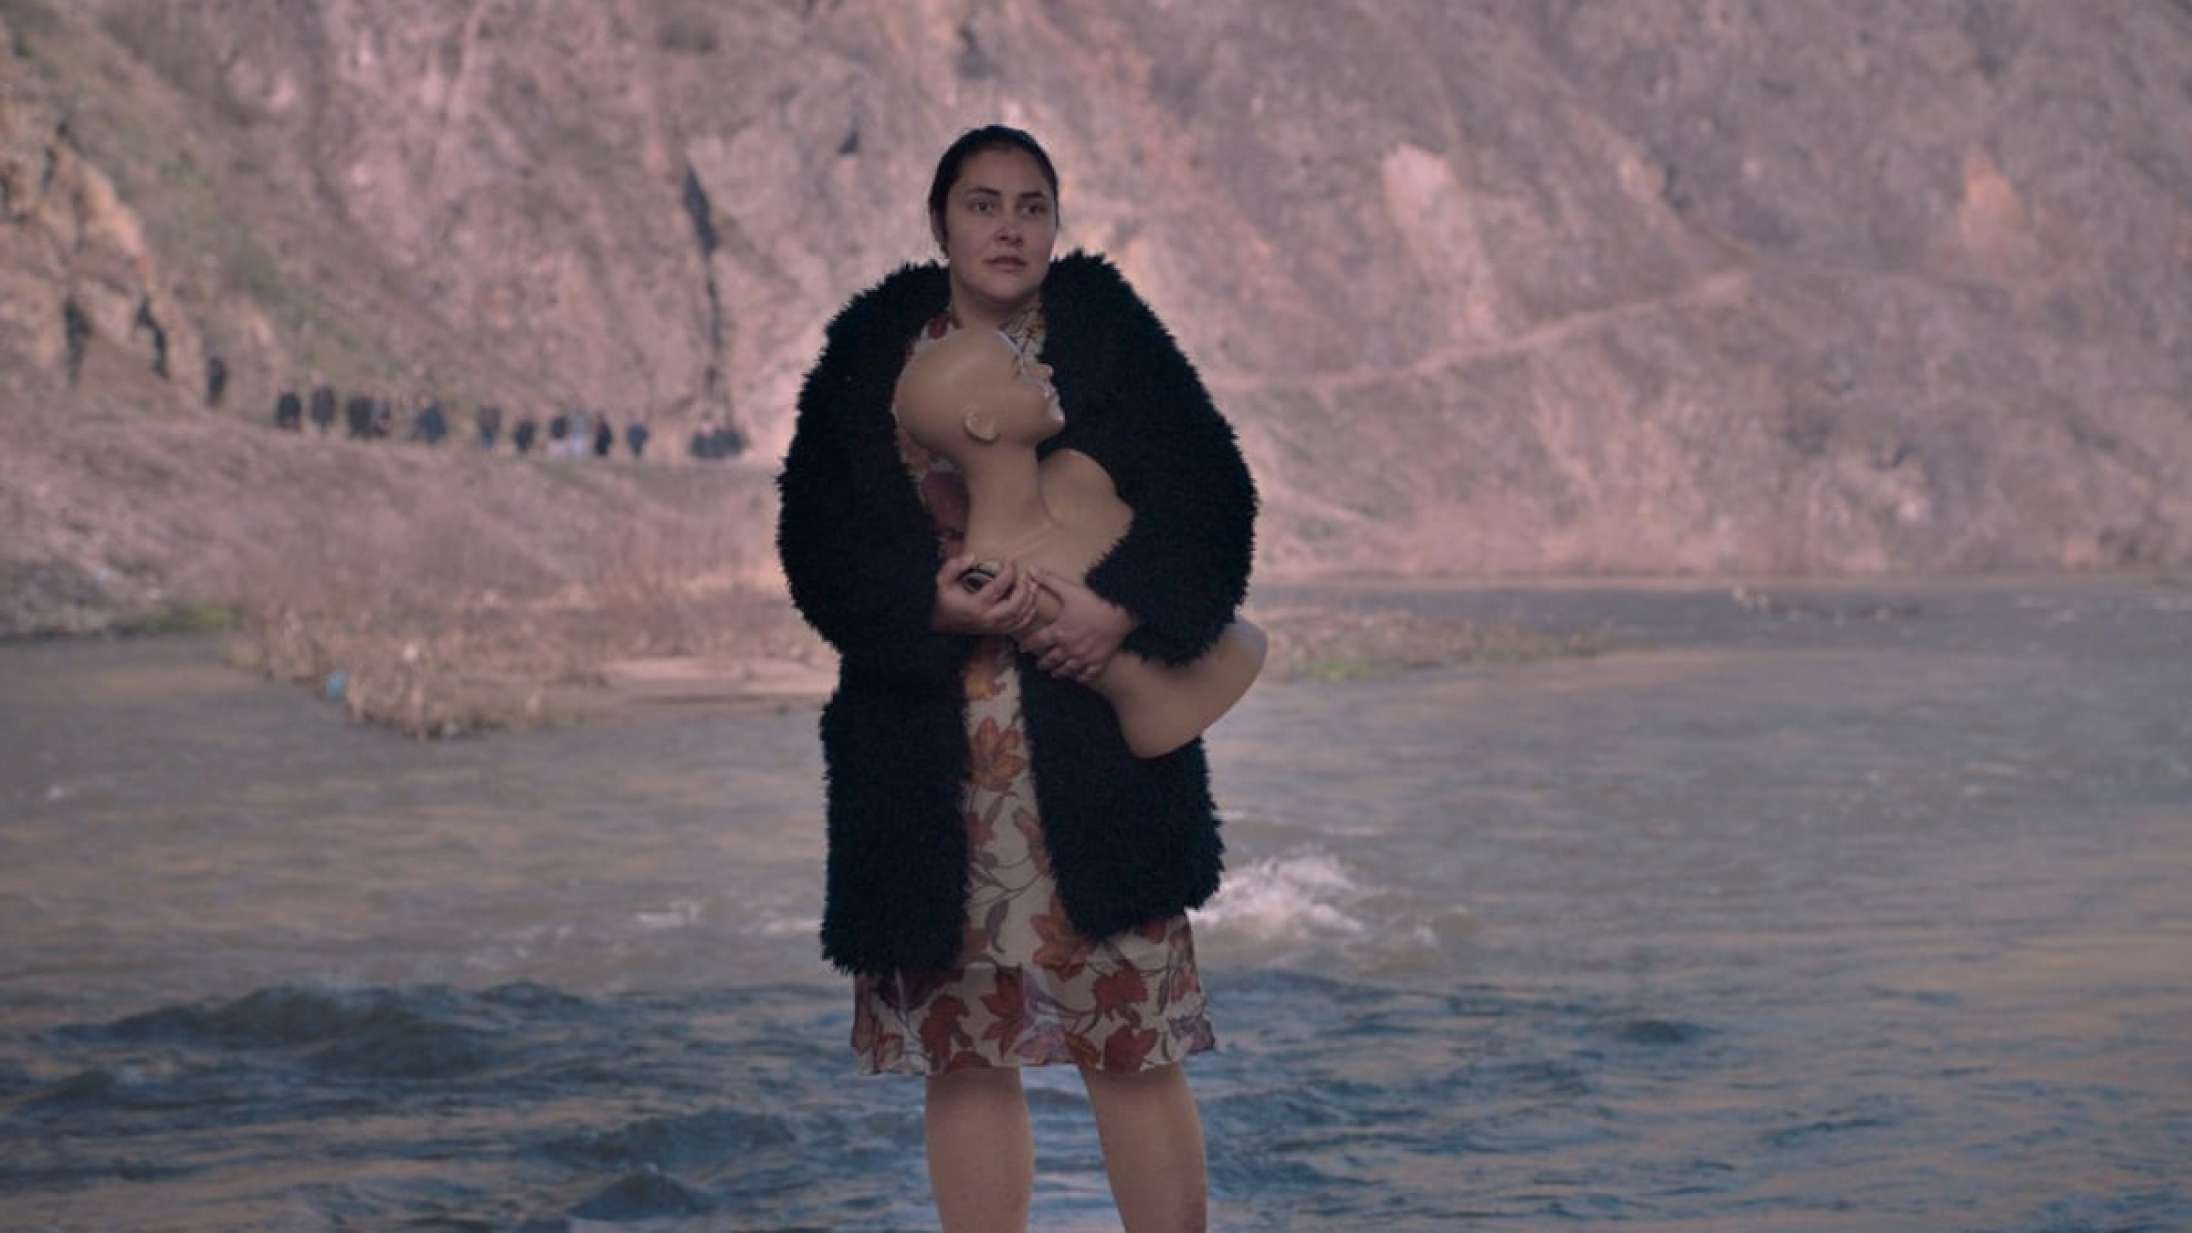 'Gud eksisterer, hendes navn er Petrunya': Satire om 32-årig slacker er ikke hverdagskost på det store lærred